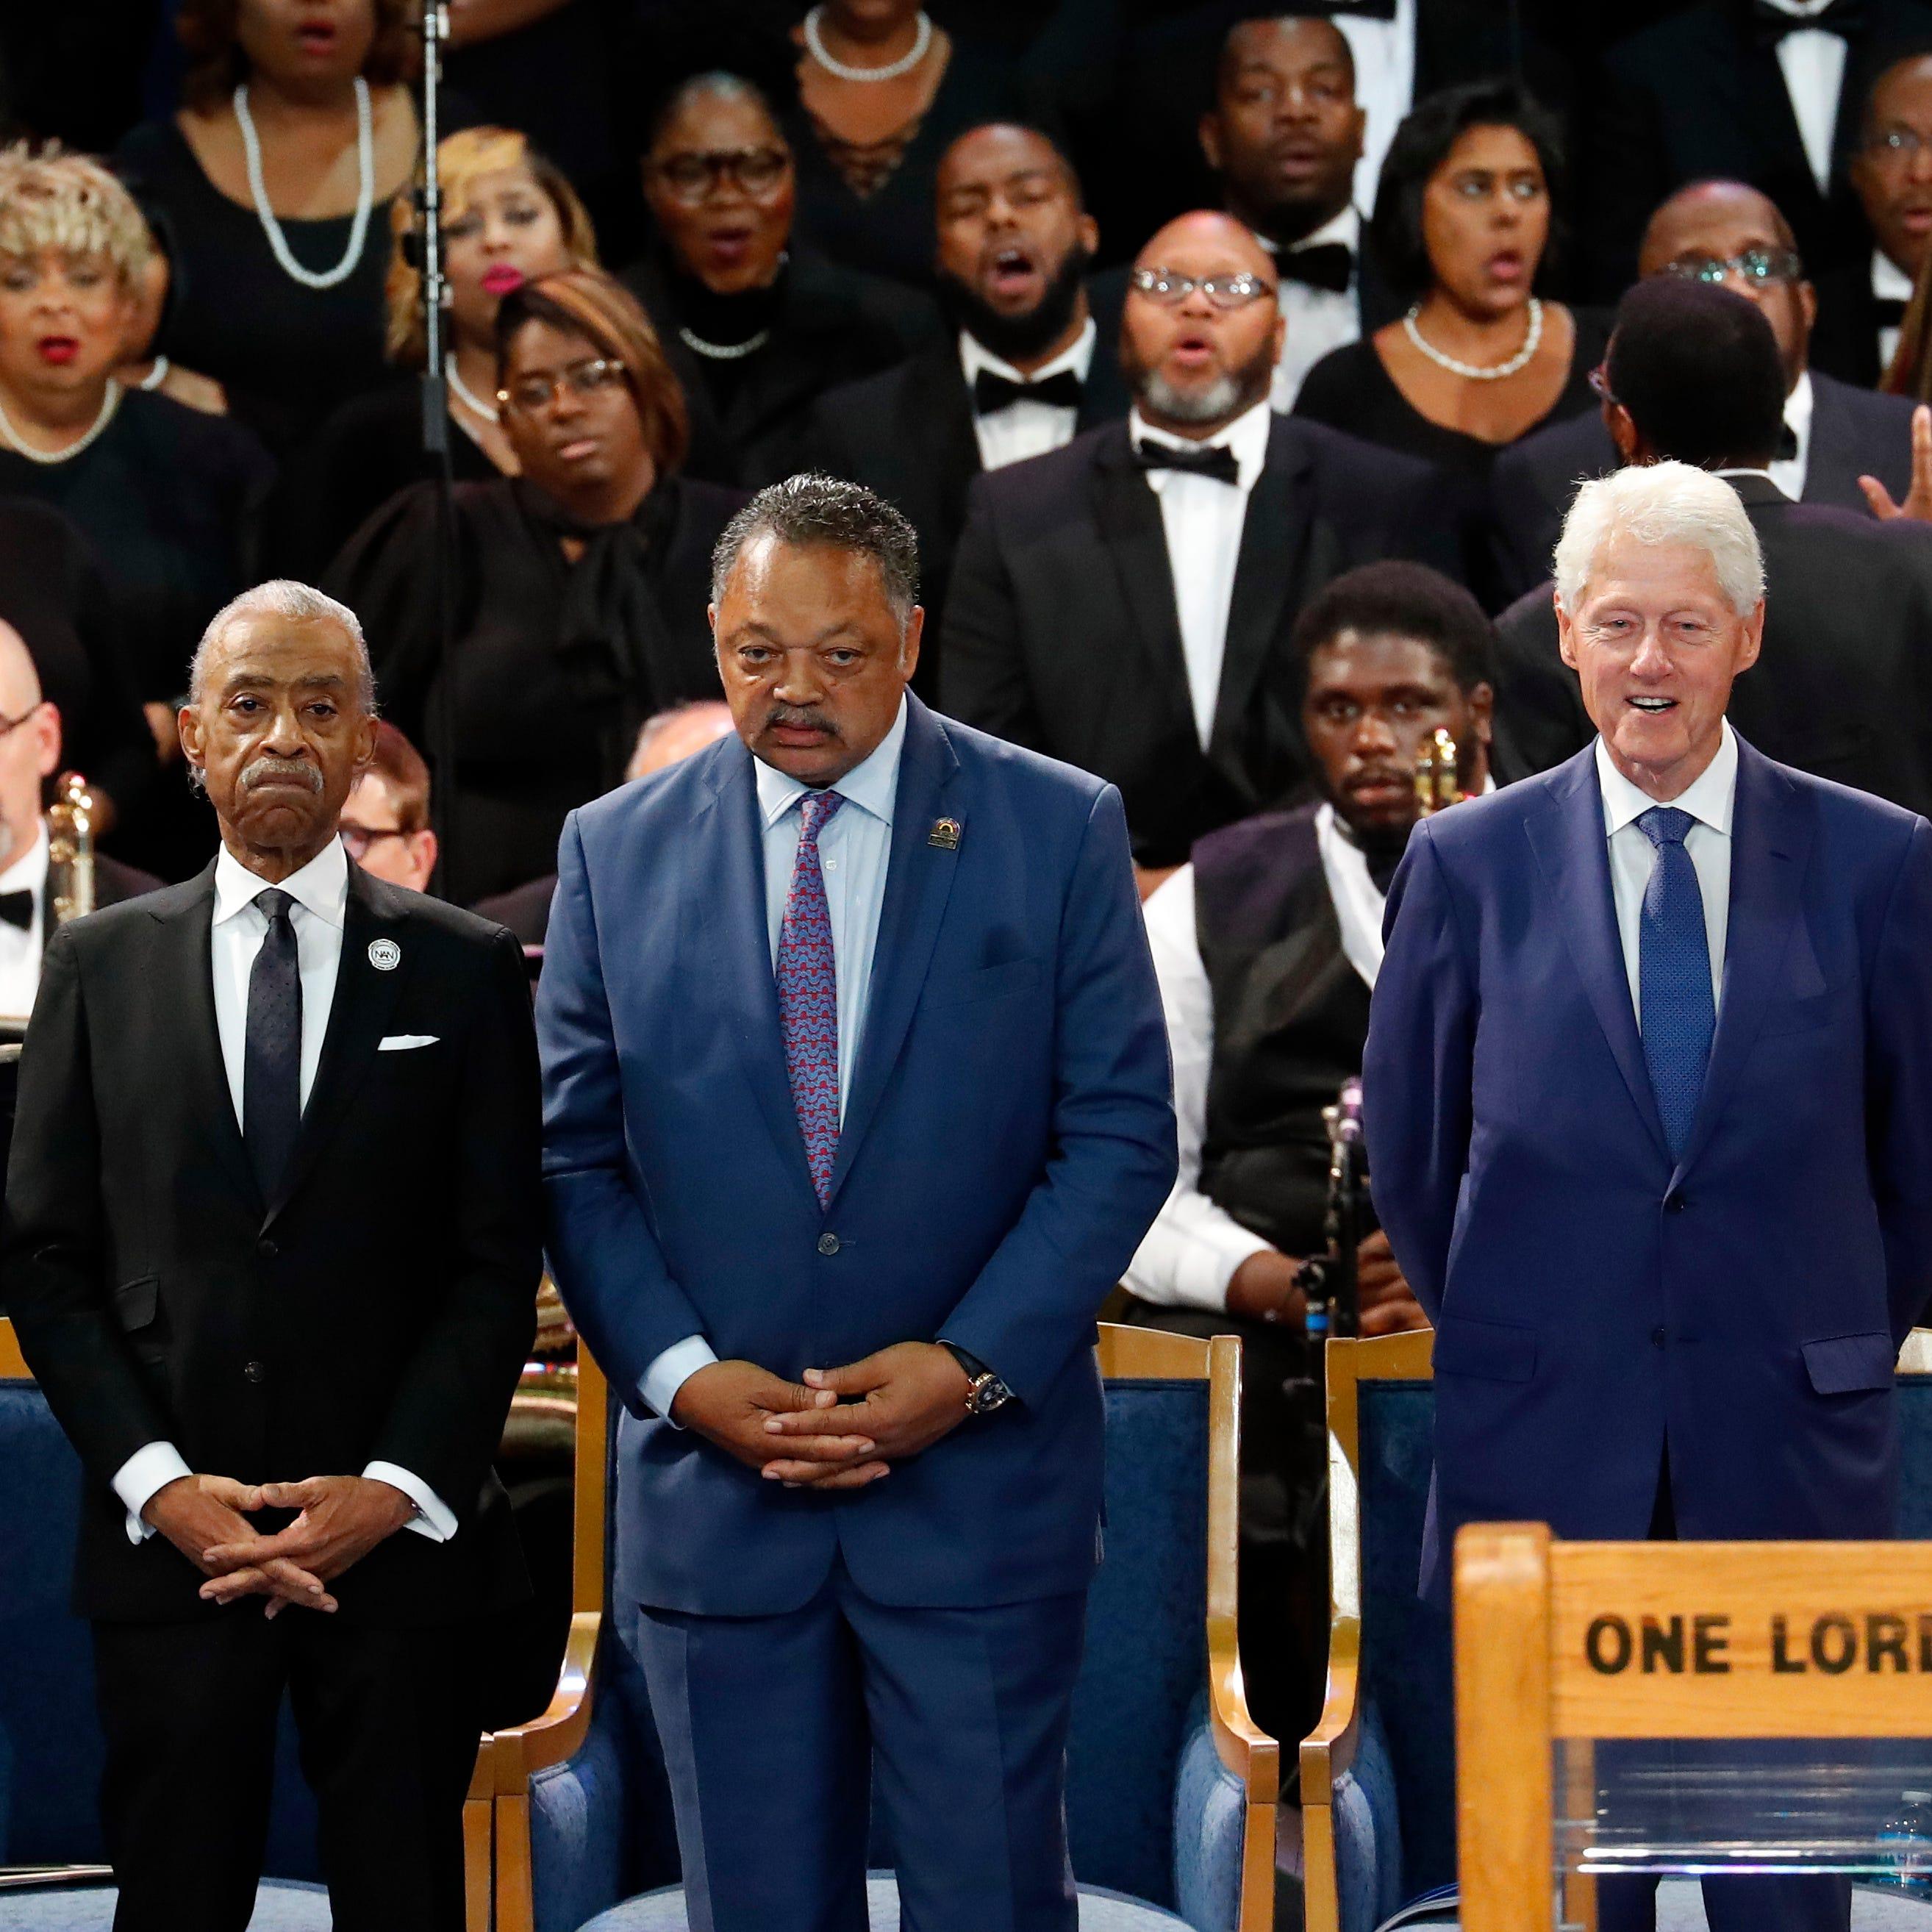 Anti-Trump bigots hear truth about No. 1 problem in the black community